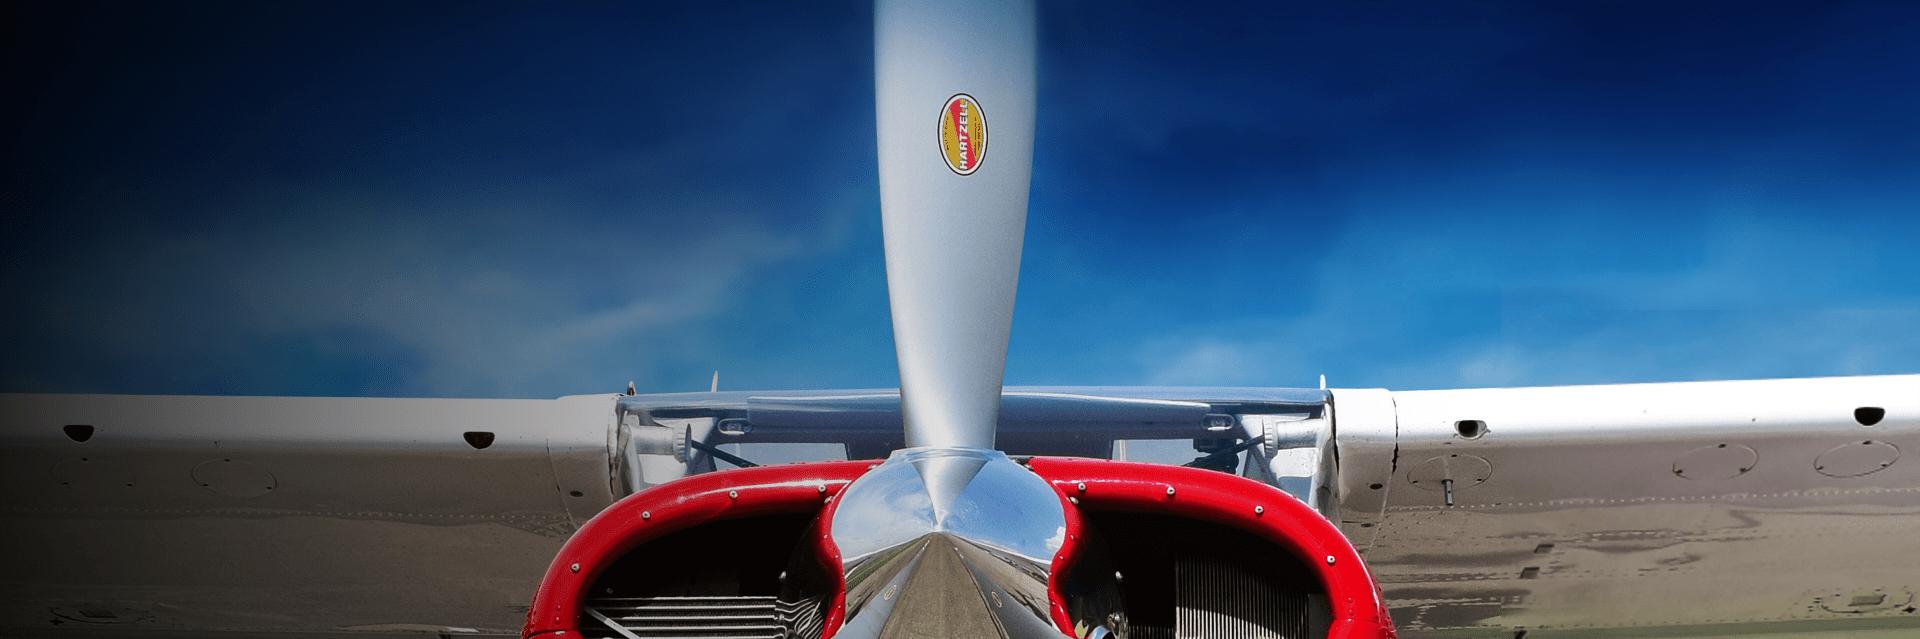 Closeup of Hartzell Propeller